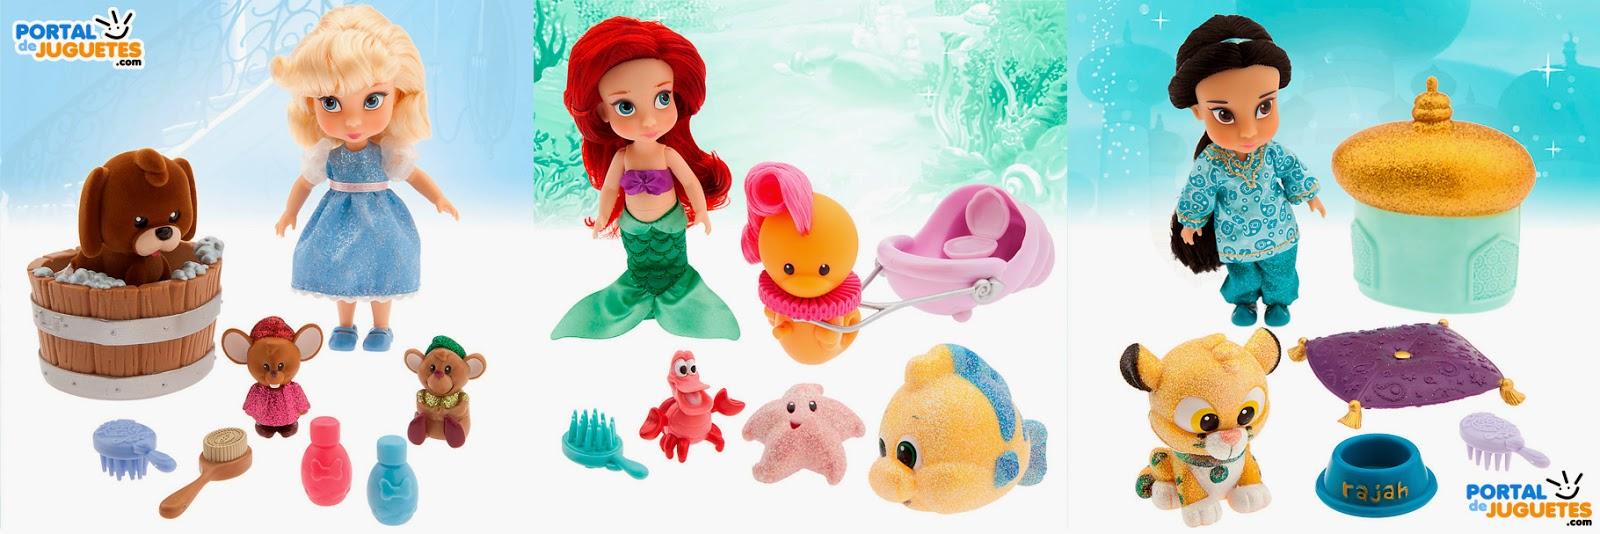 Minimuñecas Ariel Yasmin Cenicienta Coleccion Disney Animators